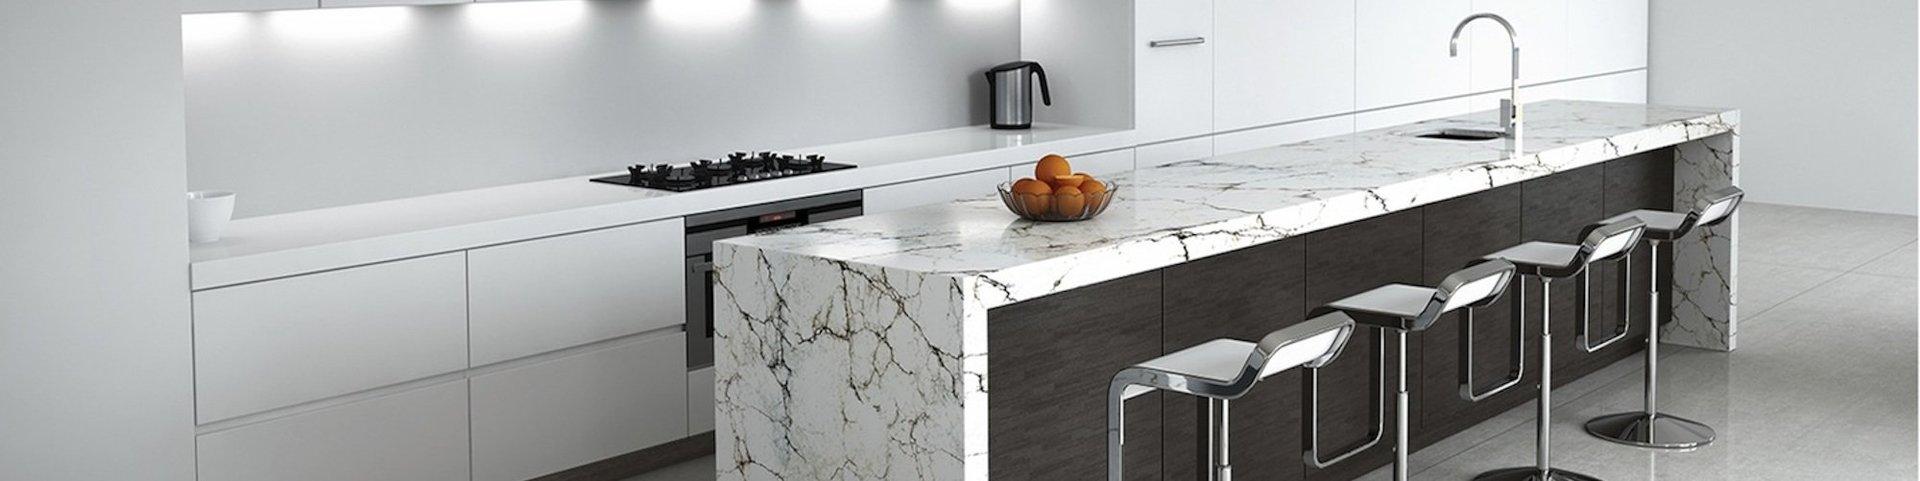 bancone cucina in marmo